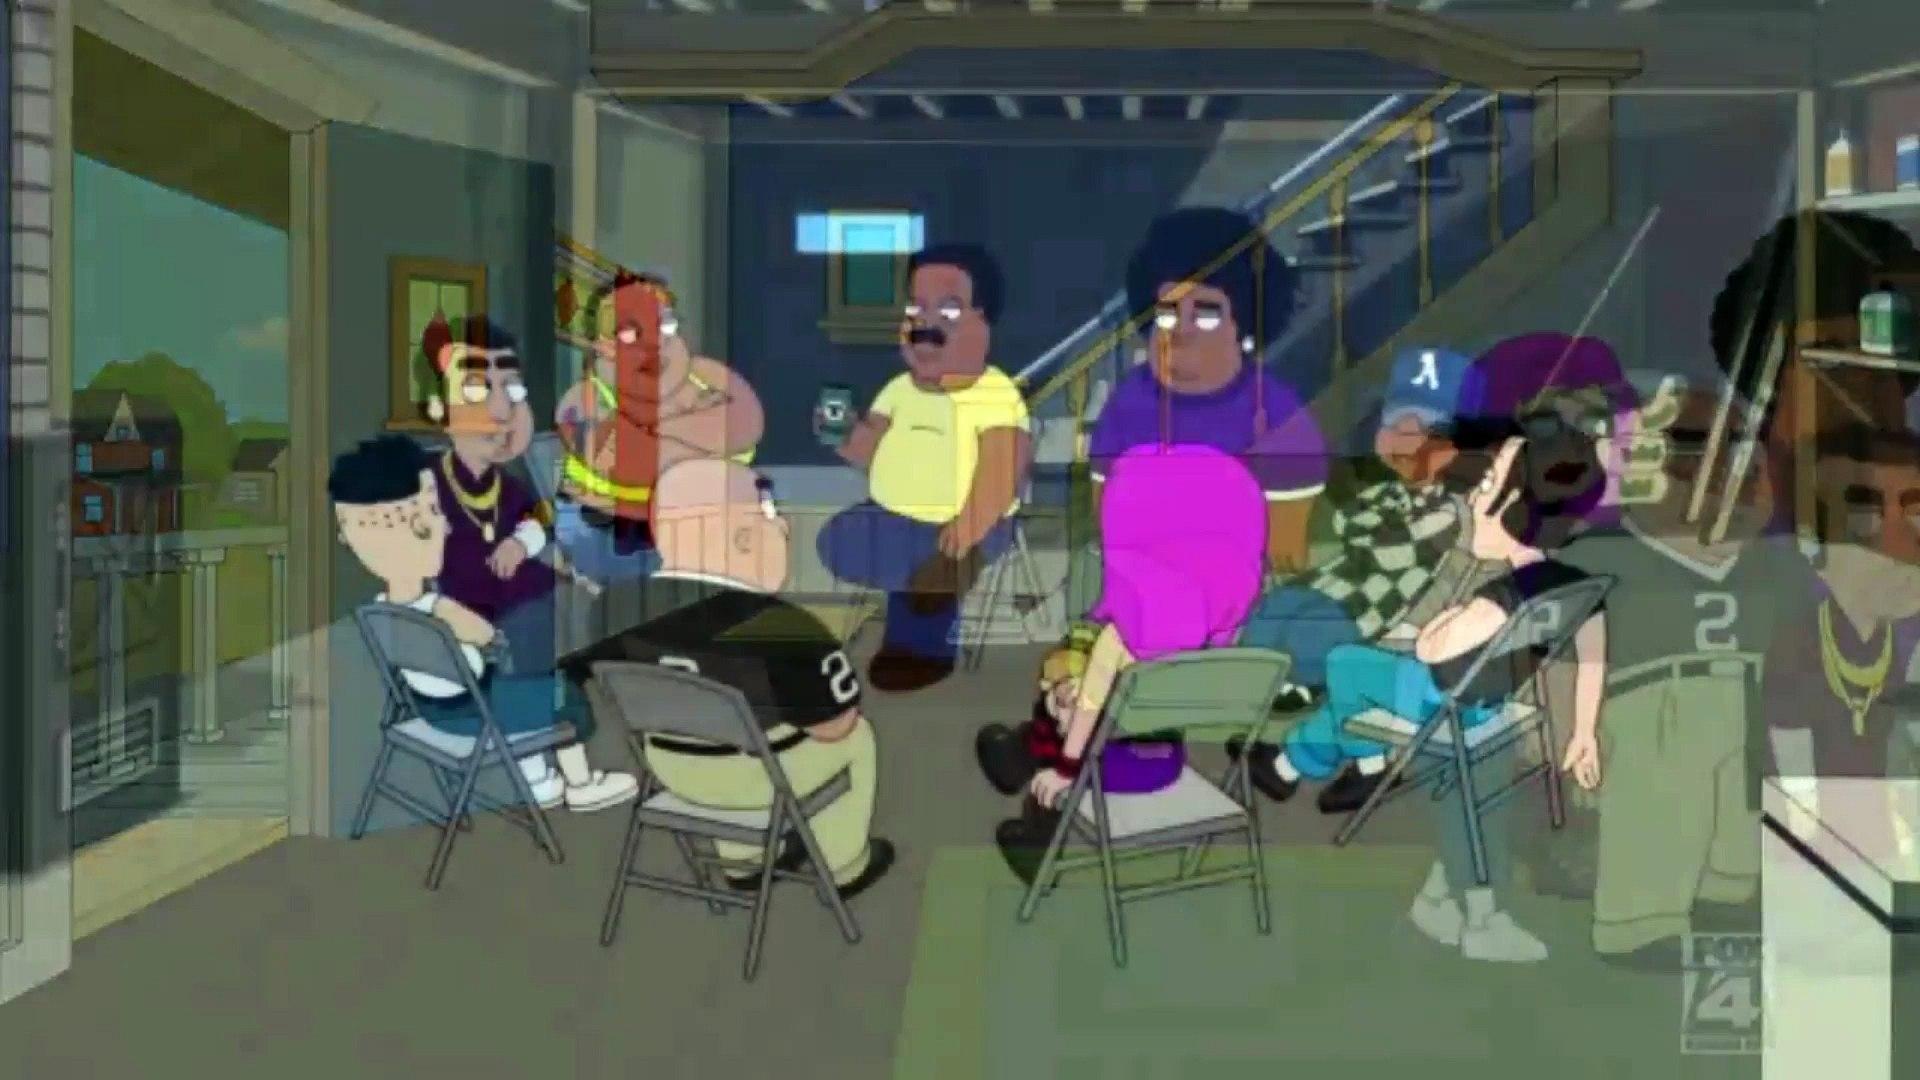 The Cleveland Show S01E12 Clip#2.